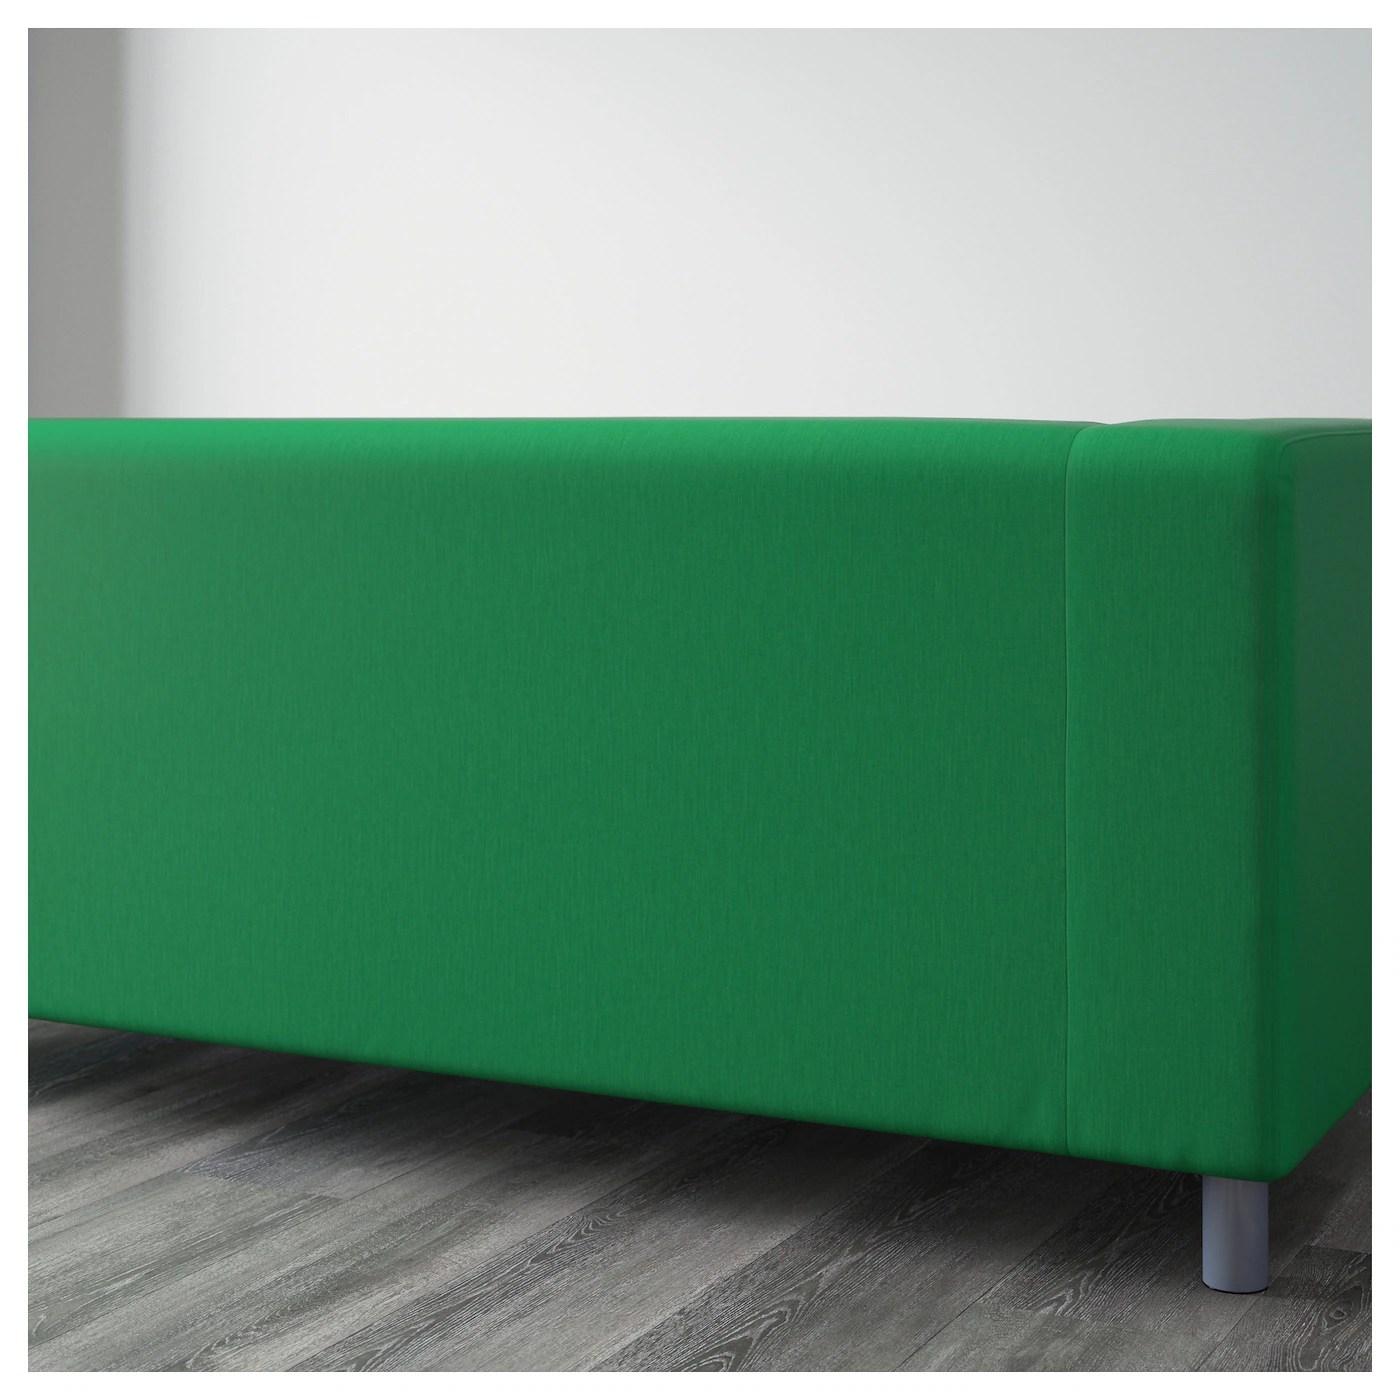 ikea klippan sofa cover red greensboro nc two seat flackarp green